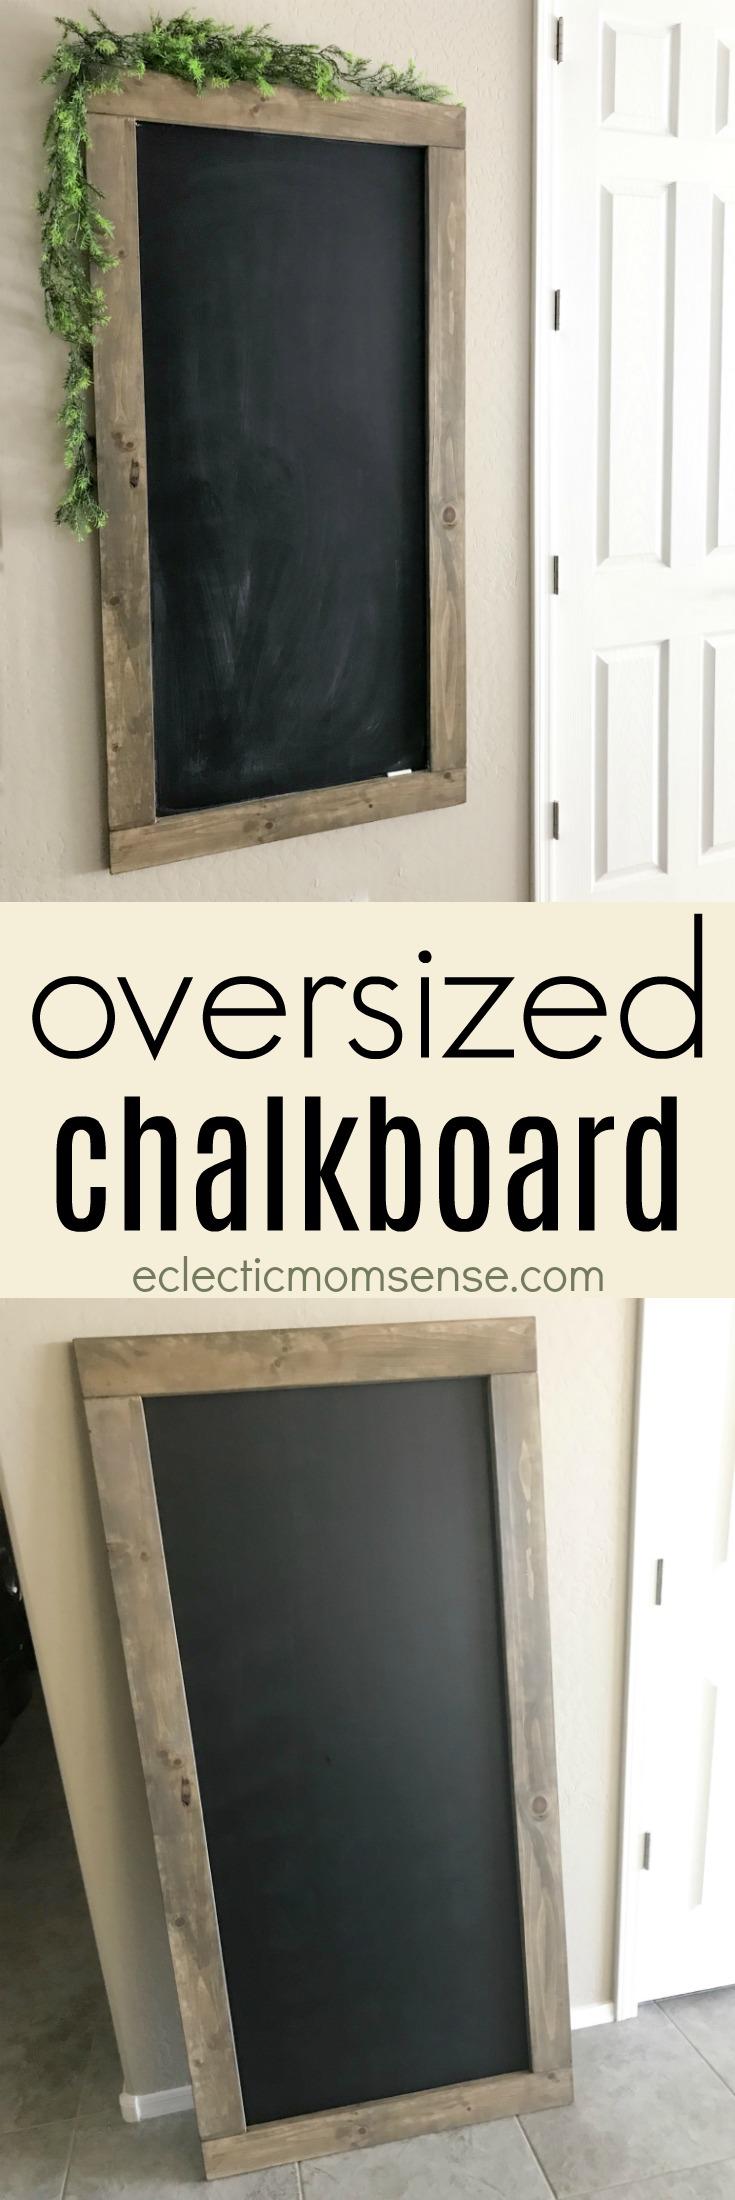 Oversized Rustic Chalkboard Tutorial   Big statement piece for kitchen. Great place to keep lists, menu board, or add seasonal decor and chal kart designs. #chalkboard #chalkart